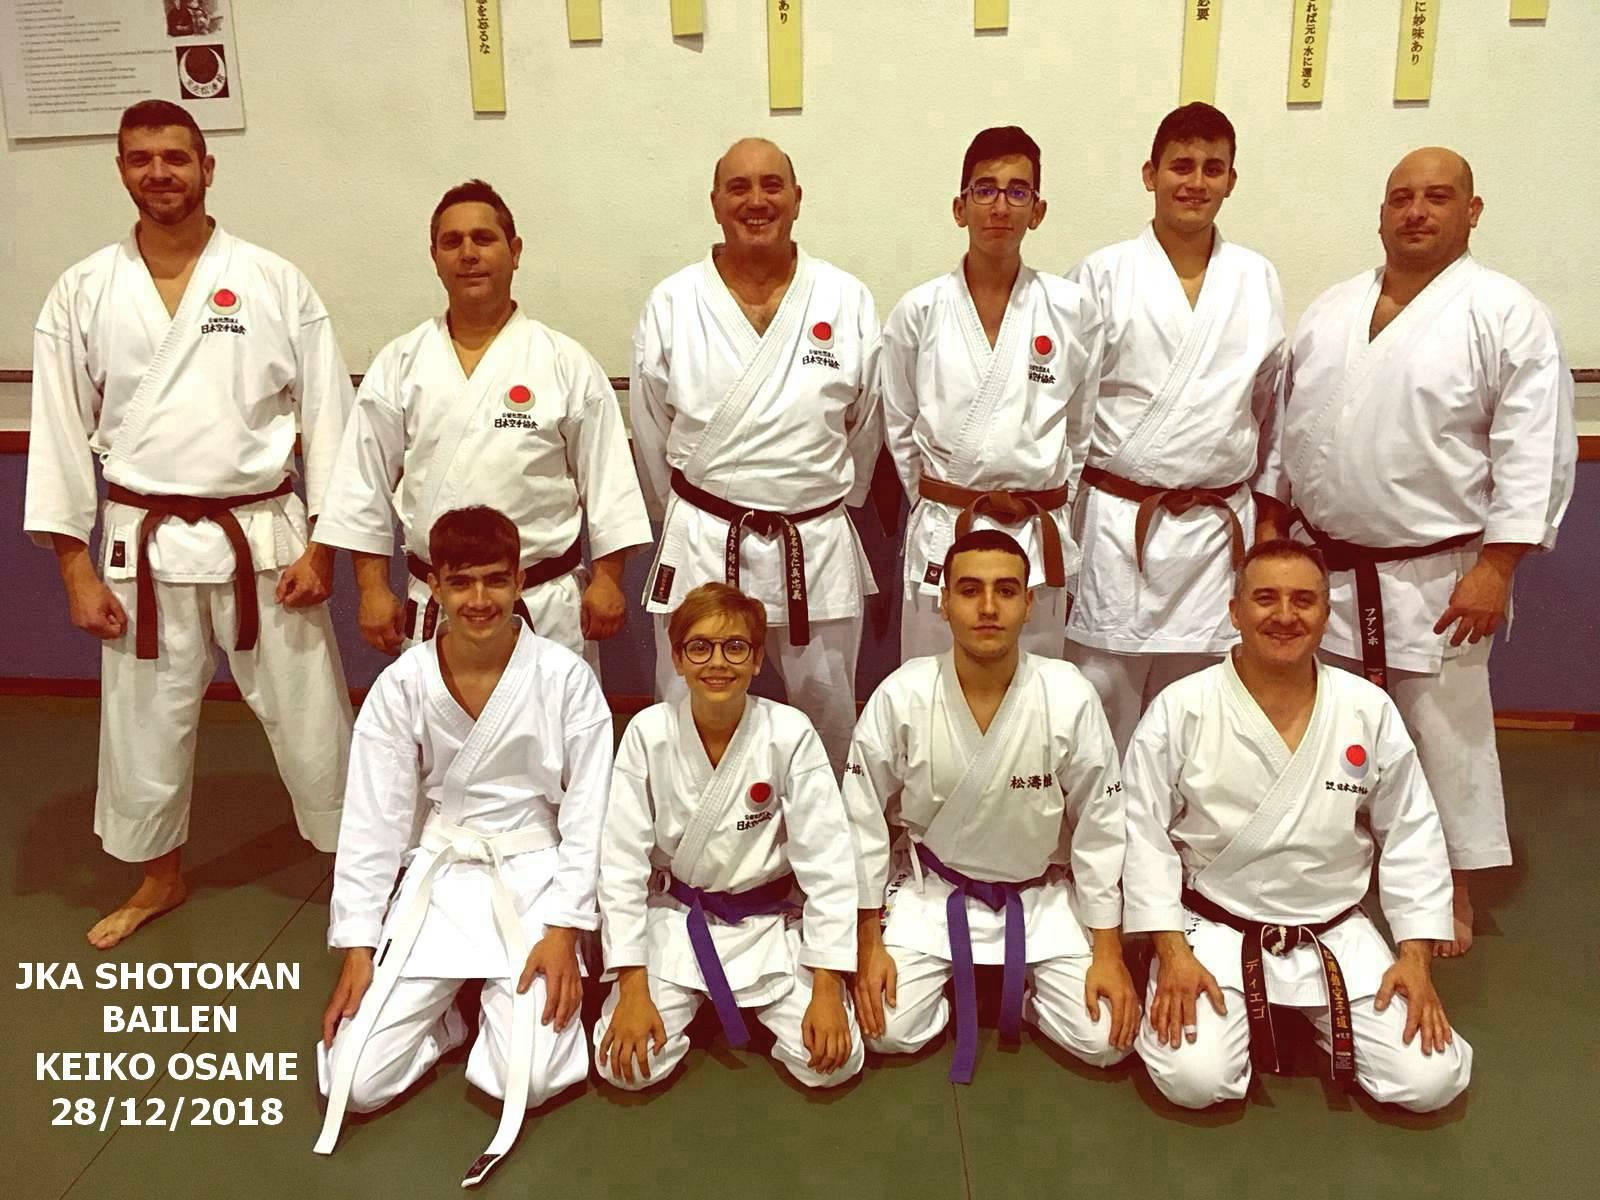 Karate Shotokan Jka Bailen Gimnasio Municipal Diciembre 2018